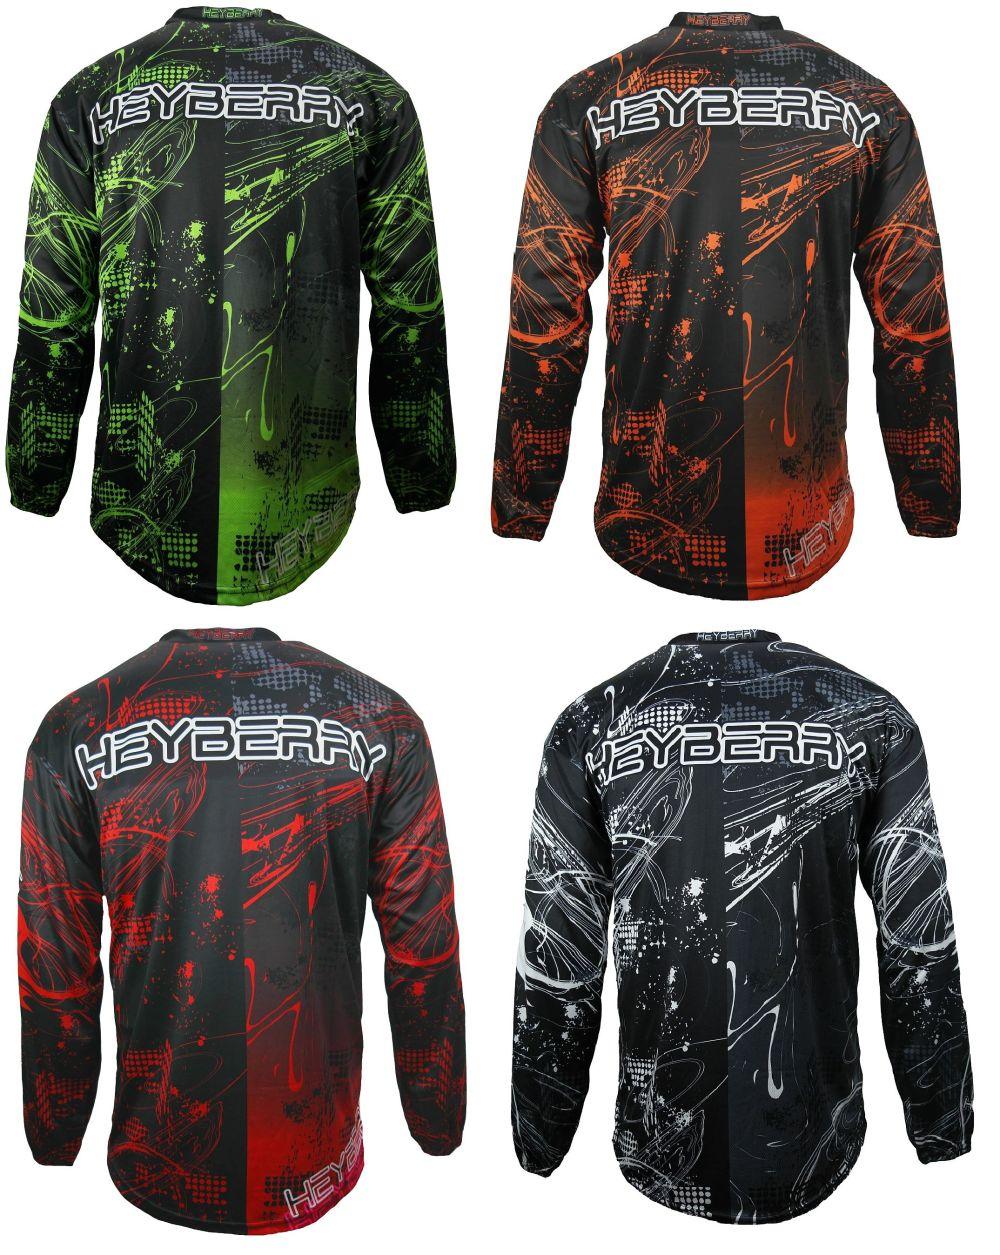 Heyberry MX-Cross Quad Motocross Shirt Jersey Trikot schwarz weiß grau M XXL